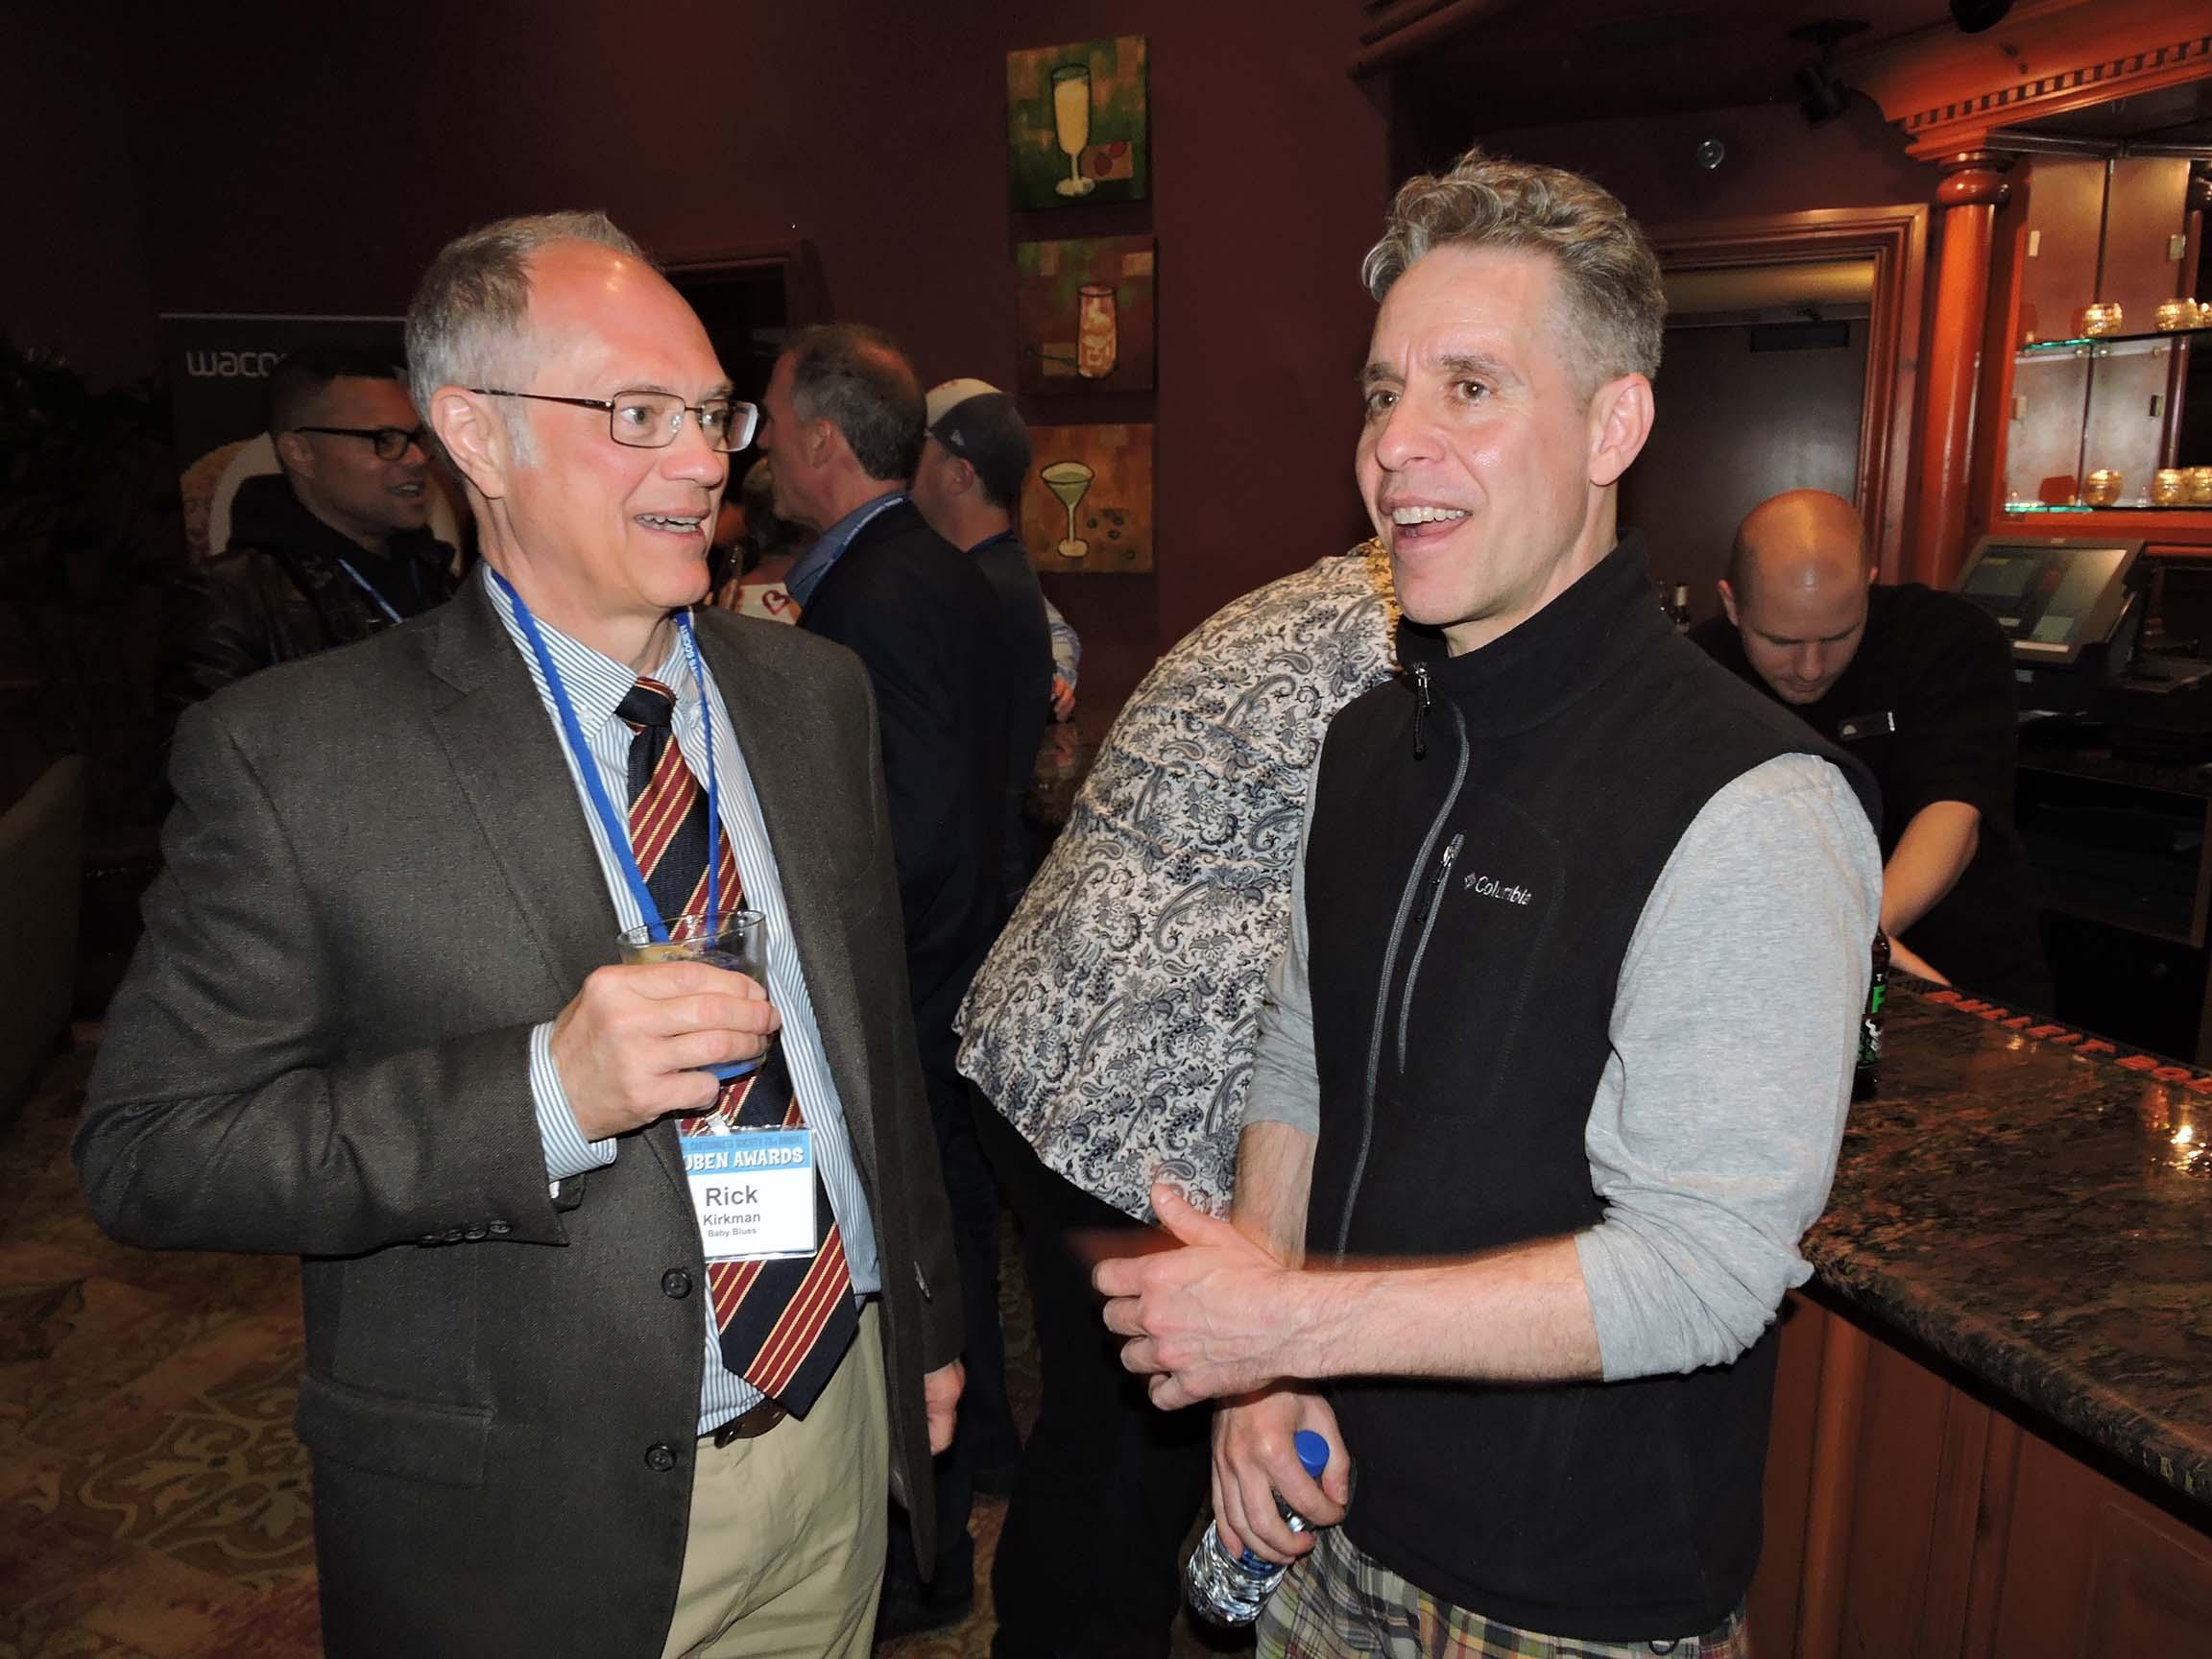 Rick Kirkman (left) and Nick Galifianakis